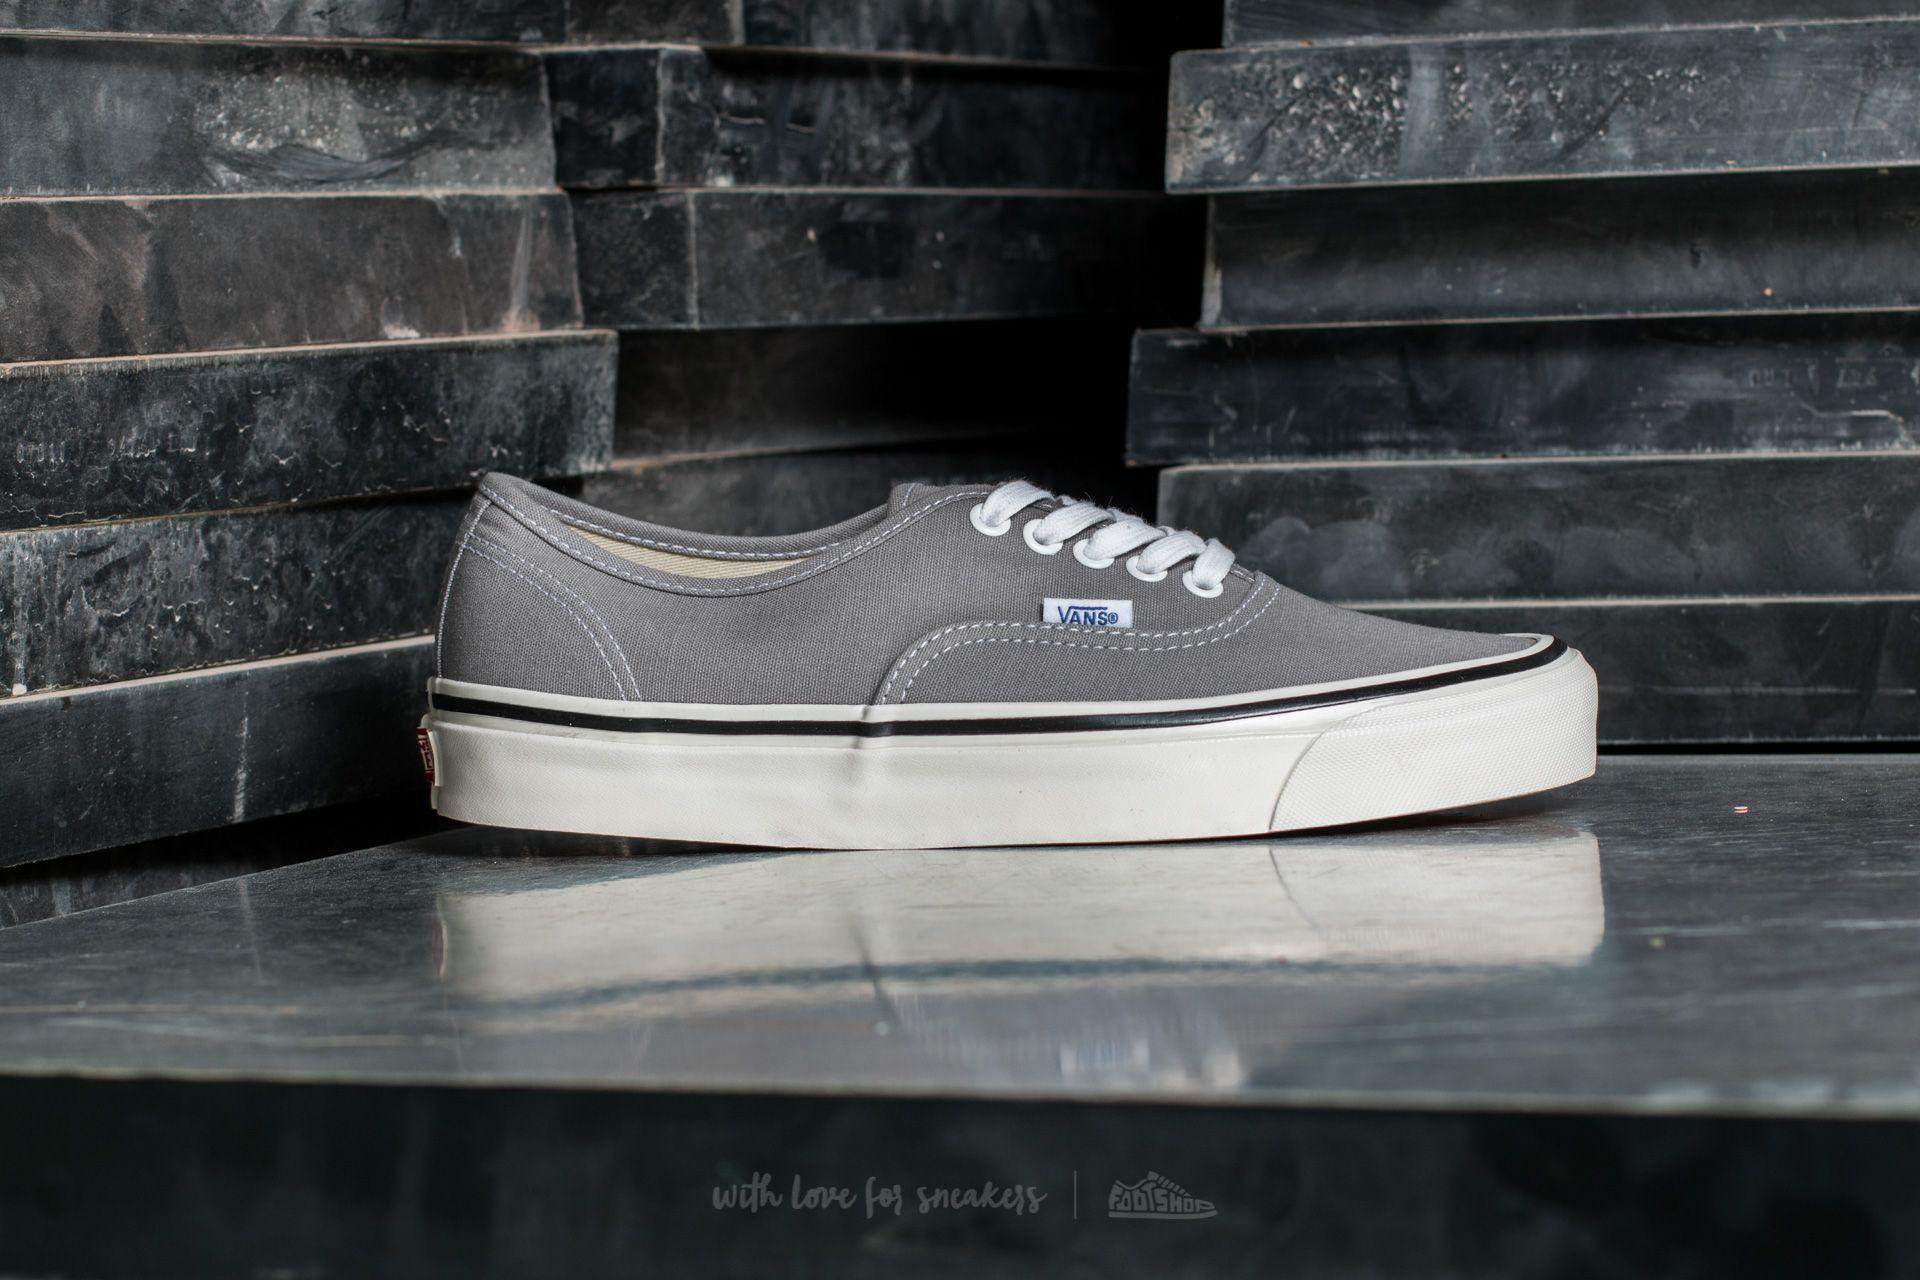 da6d3be0490 Lyst - Vans Authentic 44 Dx (anaheim Factory) Light Grey in Gray for Men